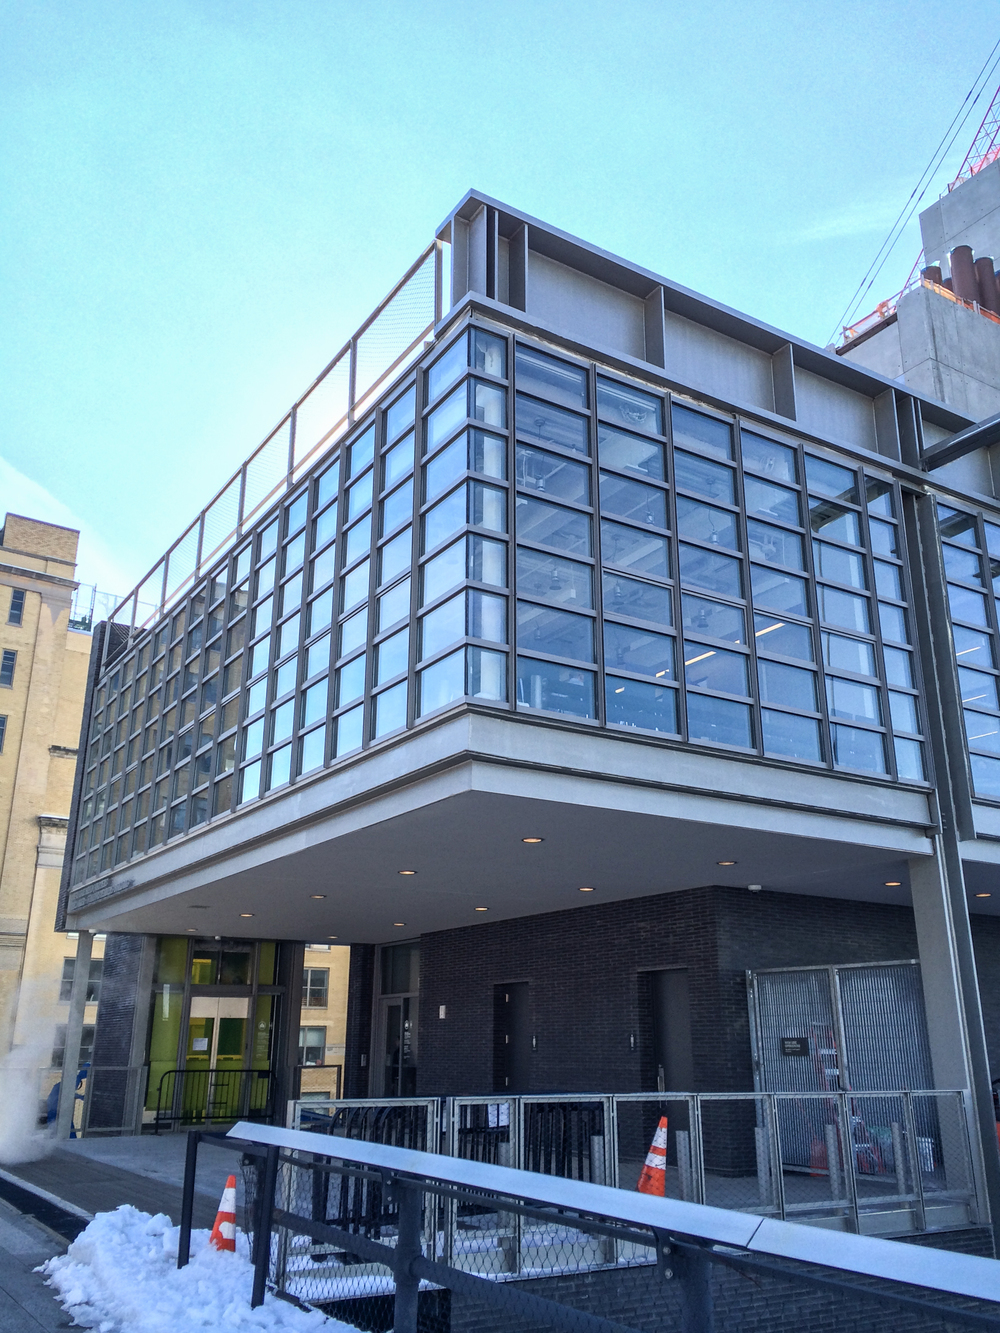 2014_02_07 High Line HQ 08.jpg